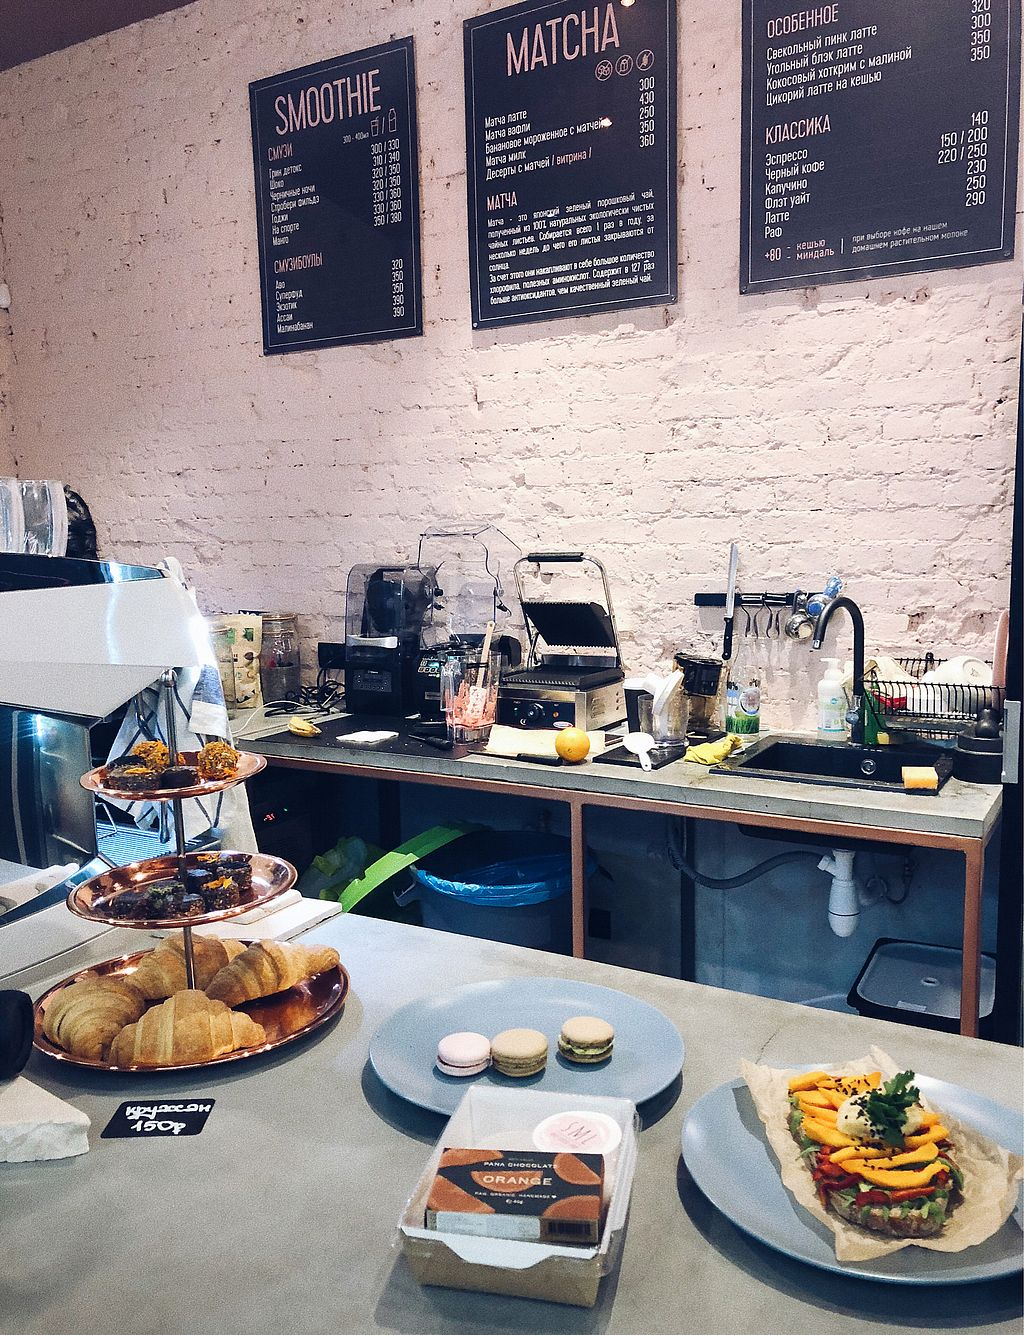 "Photo of SML Deli Coffee Shop  by <a href=""/members/profile/Evgenia"">Evgenia</a> <br/>Interior <br/> December 23, 2017  - <a href='/contact/abuse/image/107273/338372'>Report</a>"